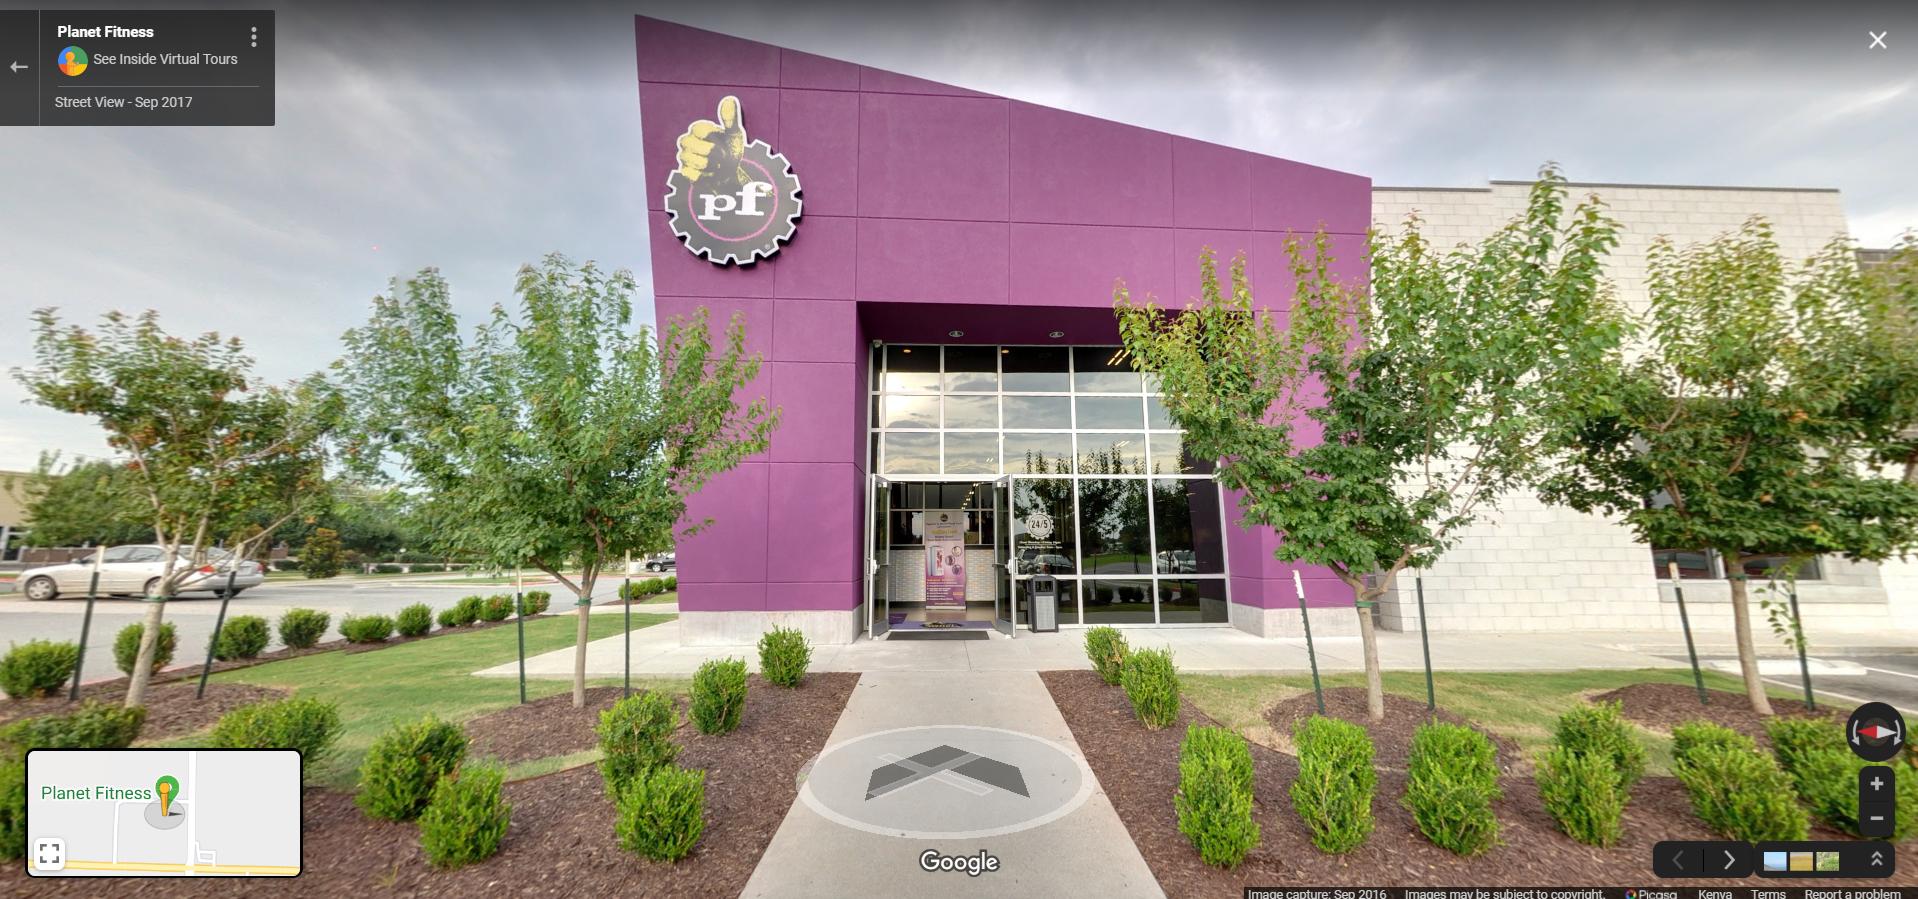 Planet Fitness - Bentonville, AR - Bentonville